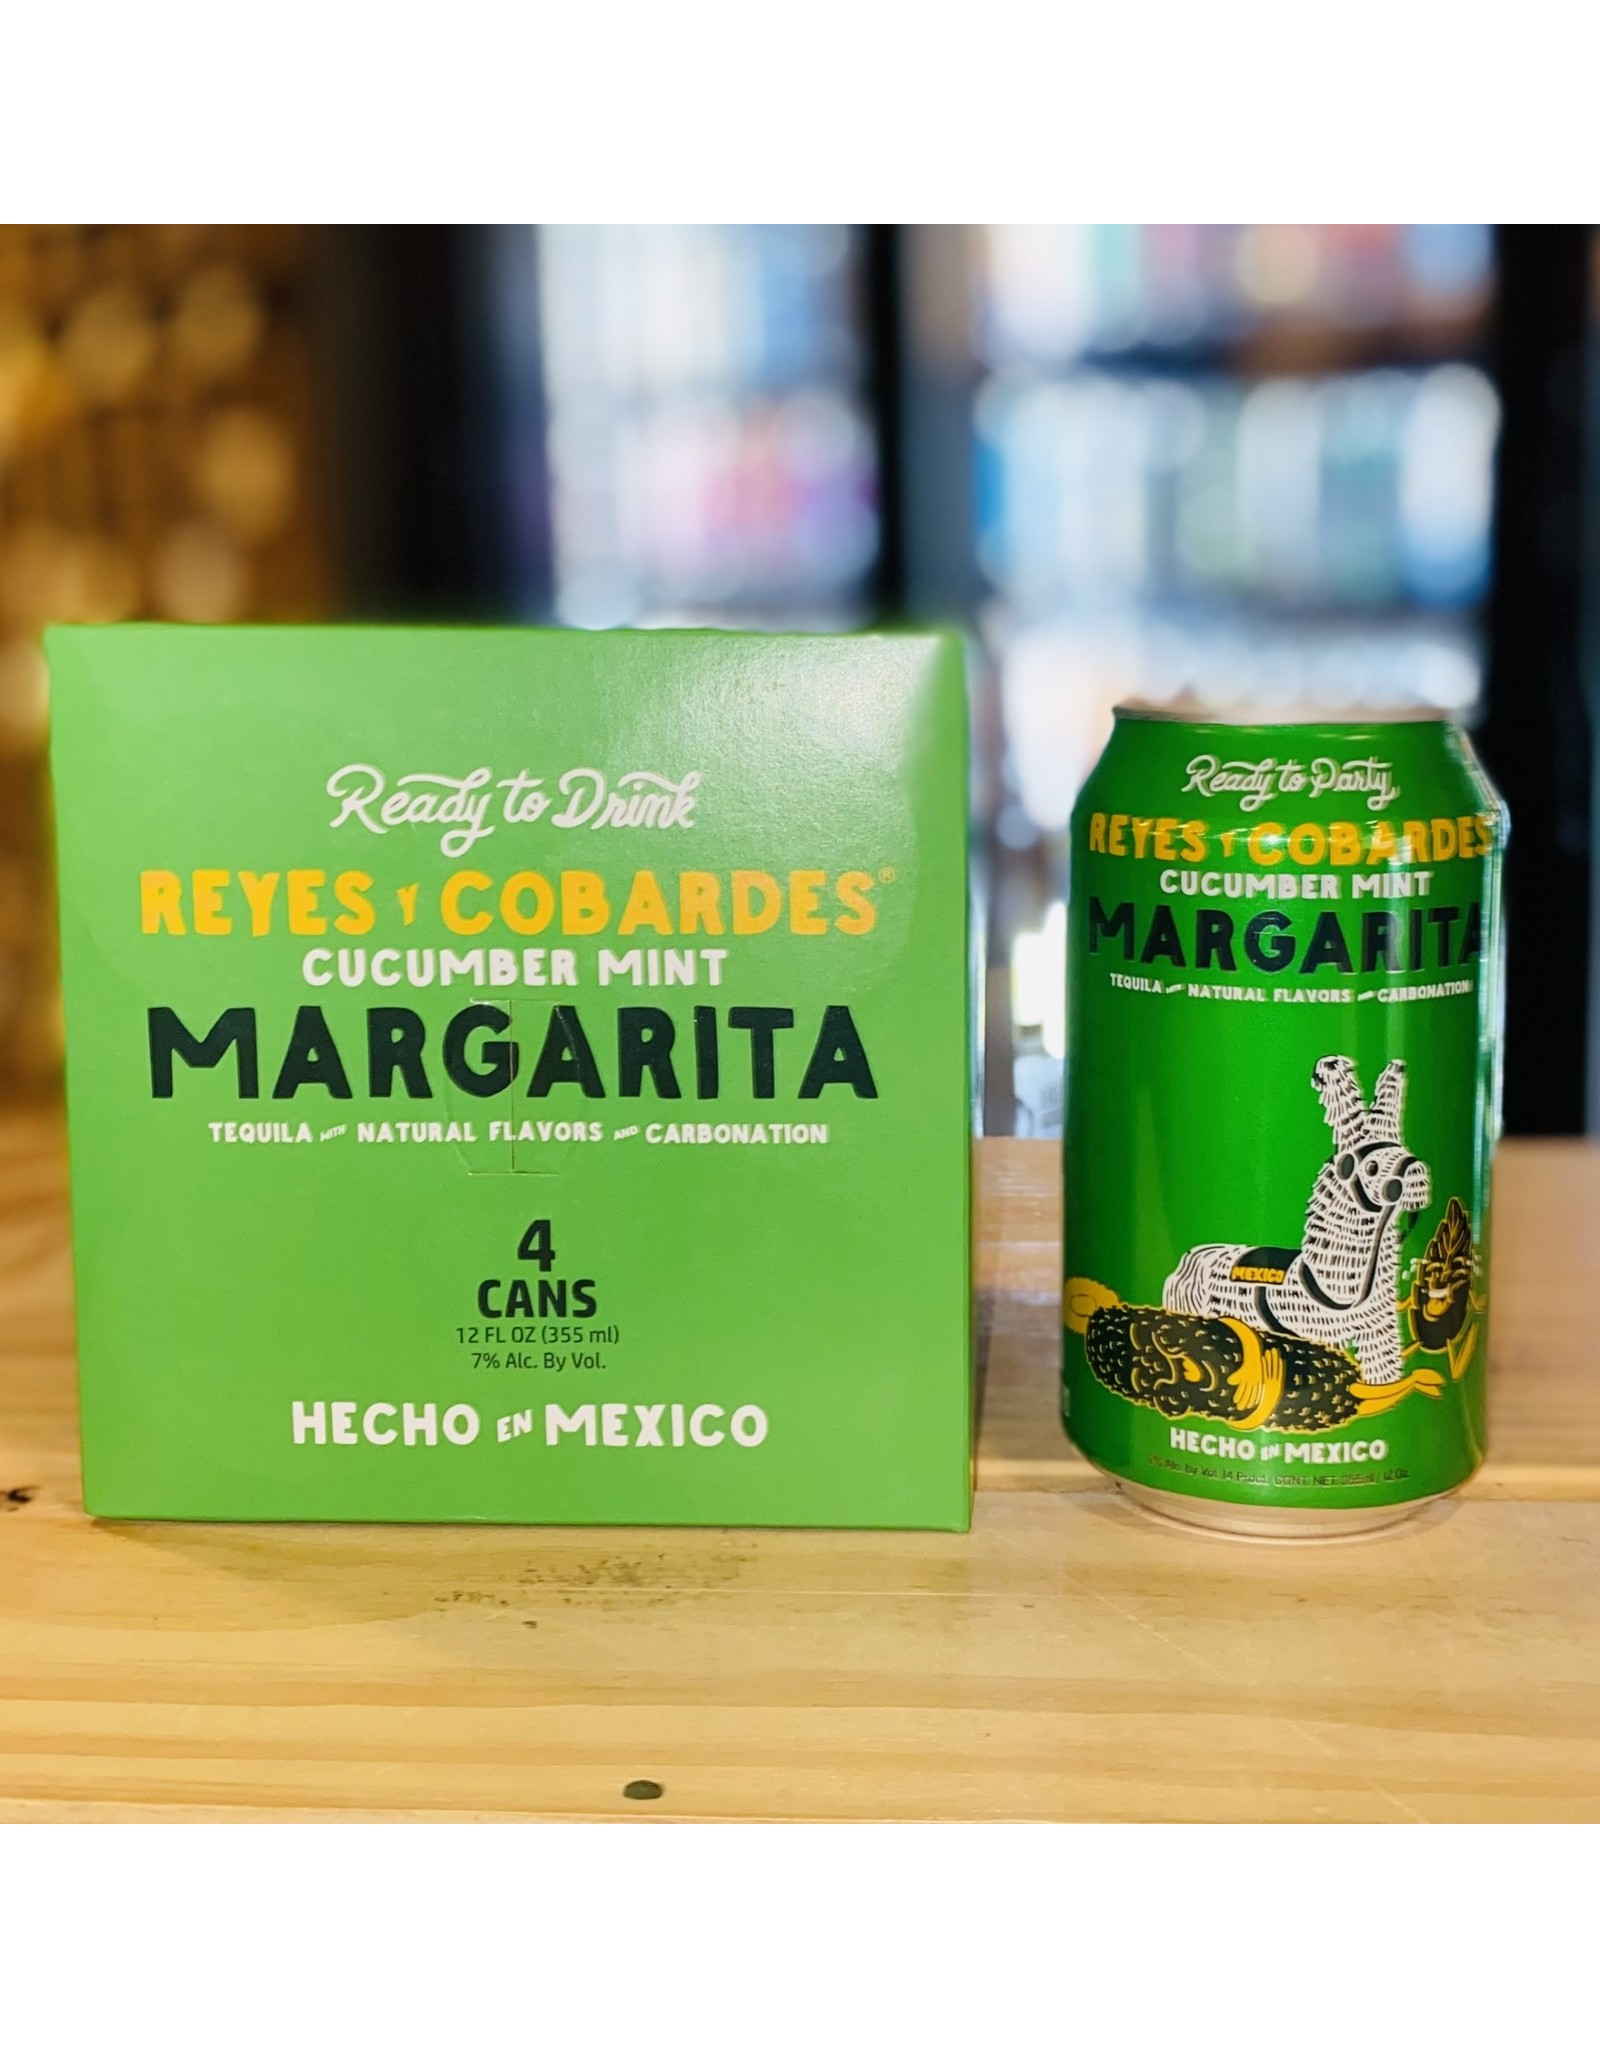 Reyes Y Cobardes RTD Cucumber Mint Margarita - Mexico